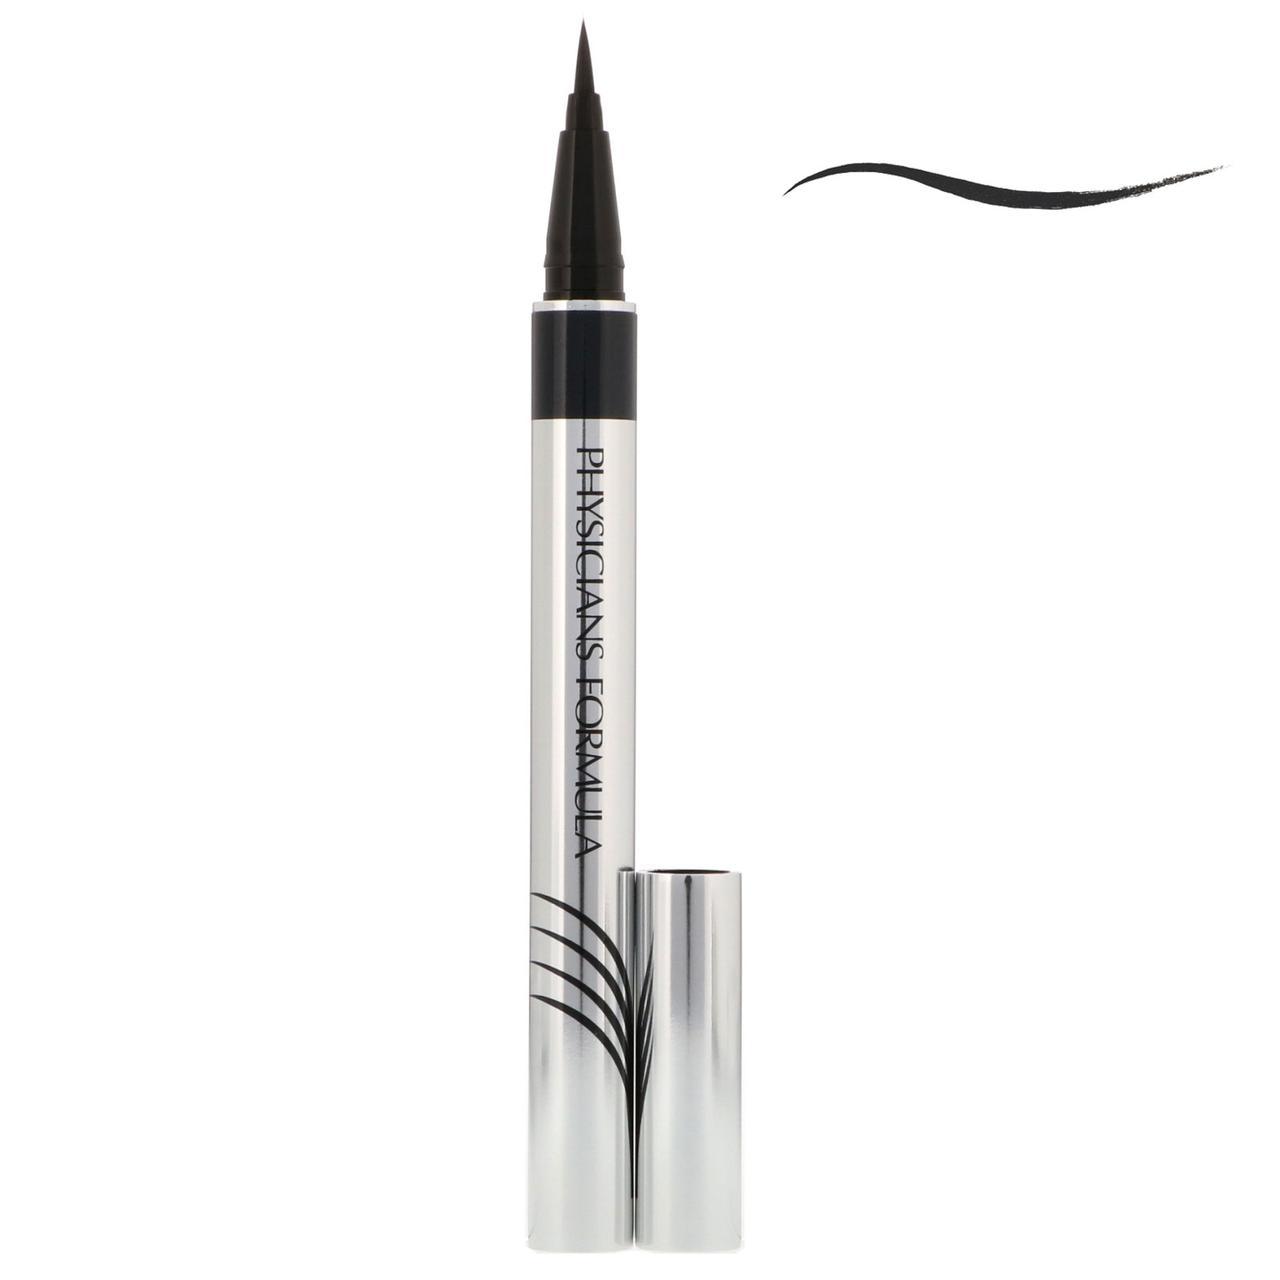 Подводка Physicians Formula Eye Booster 2-in-1 Lash Boosting Eyeliner + Serum Черная